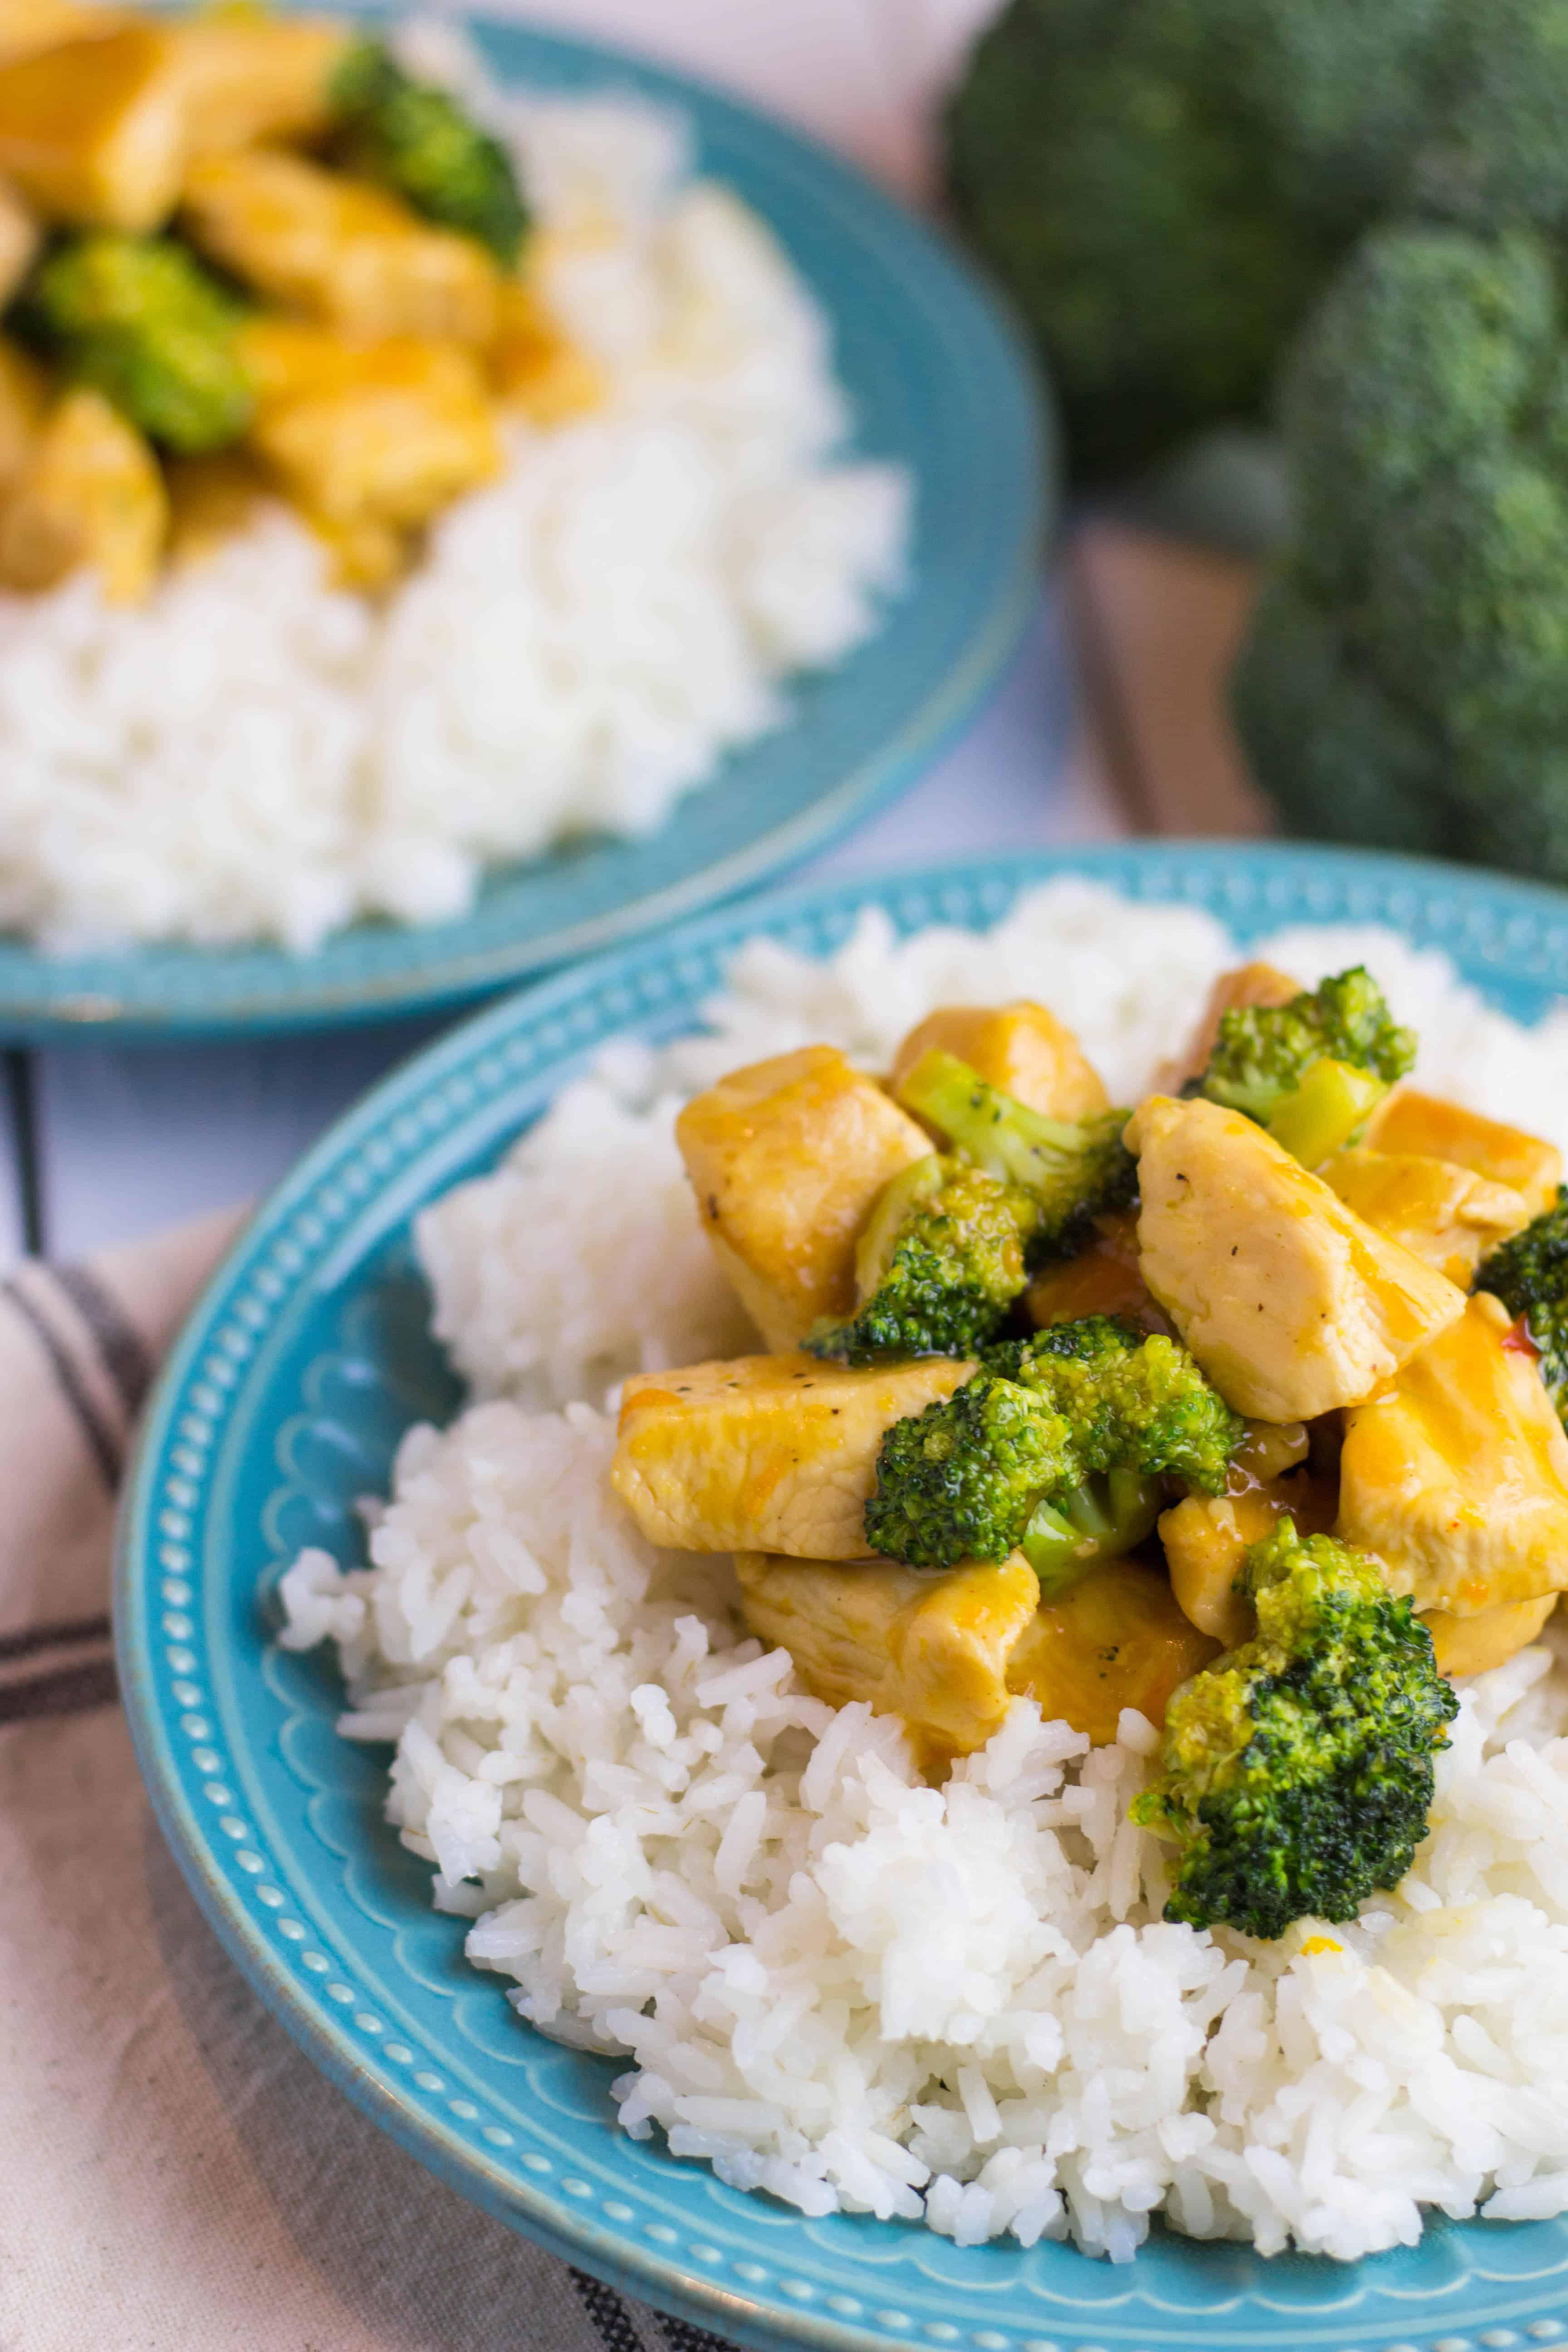 Chicken and Broccoli with Orange Glaze